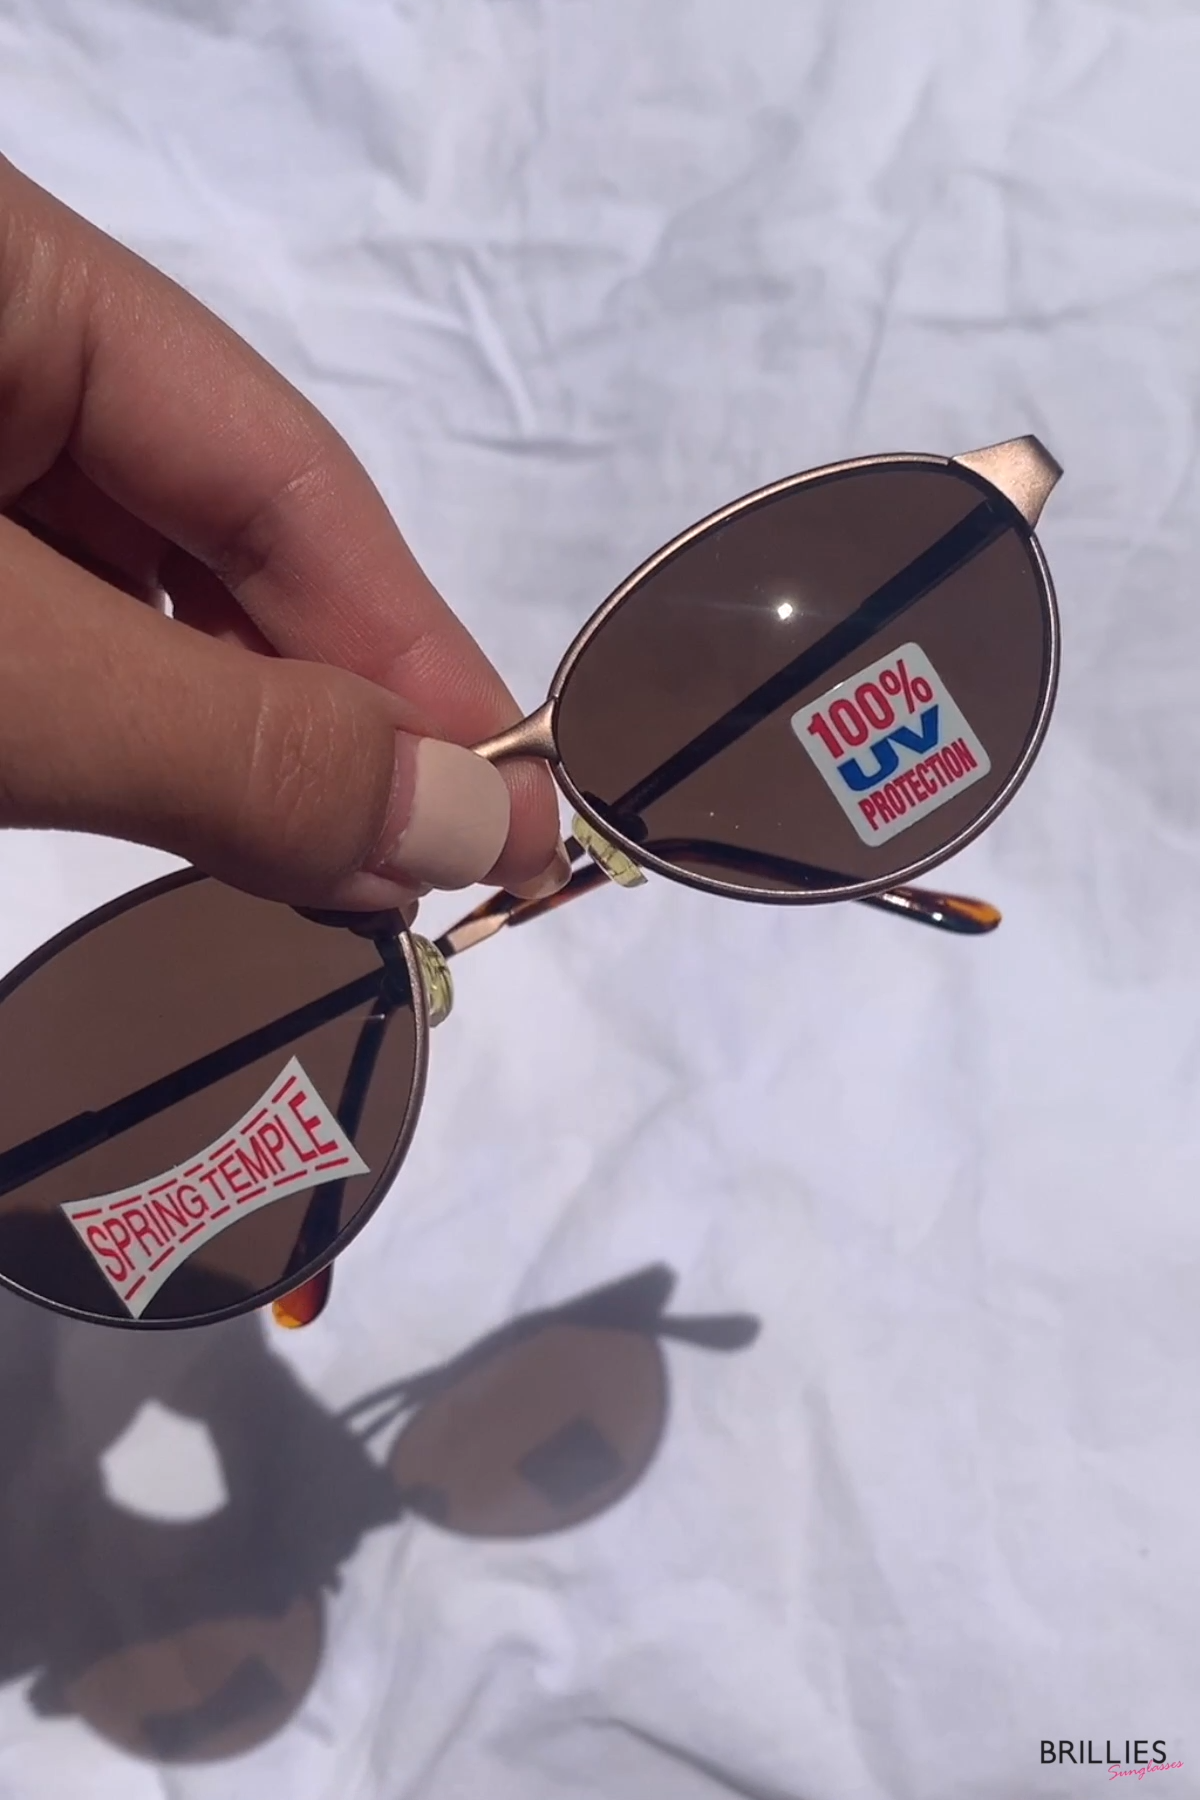 90's Oval Sunglasses NOS | Gold bronze vintage sunglasses | Deadstock round sunglasses -   19 style 90s videos ideas